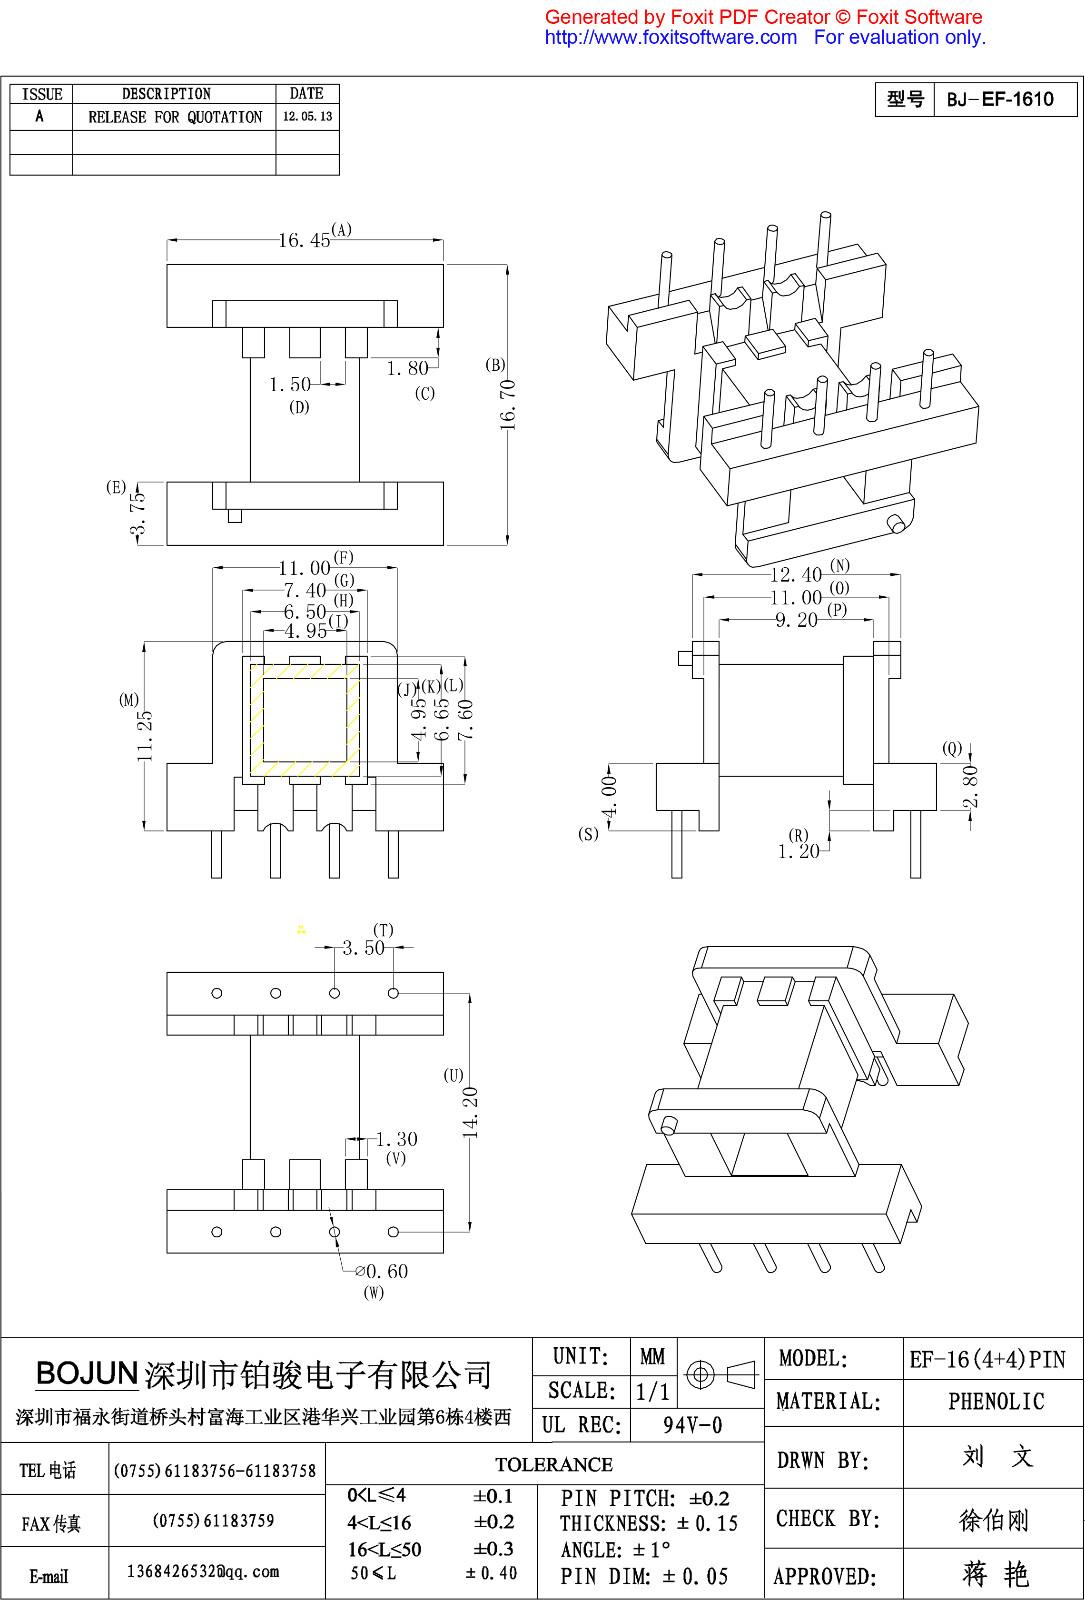 EF-1610-Model-(1).jpg